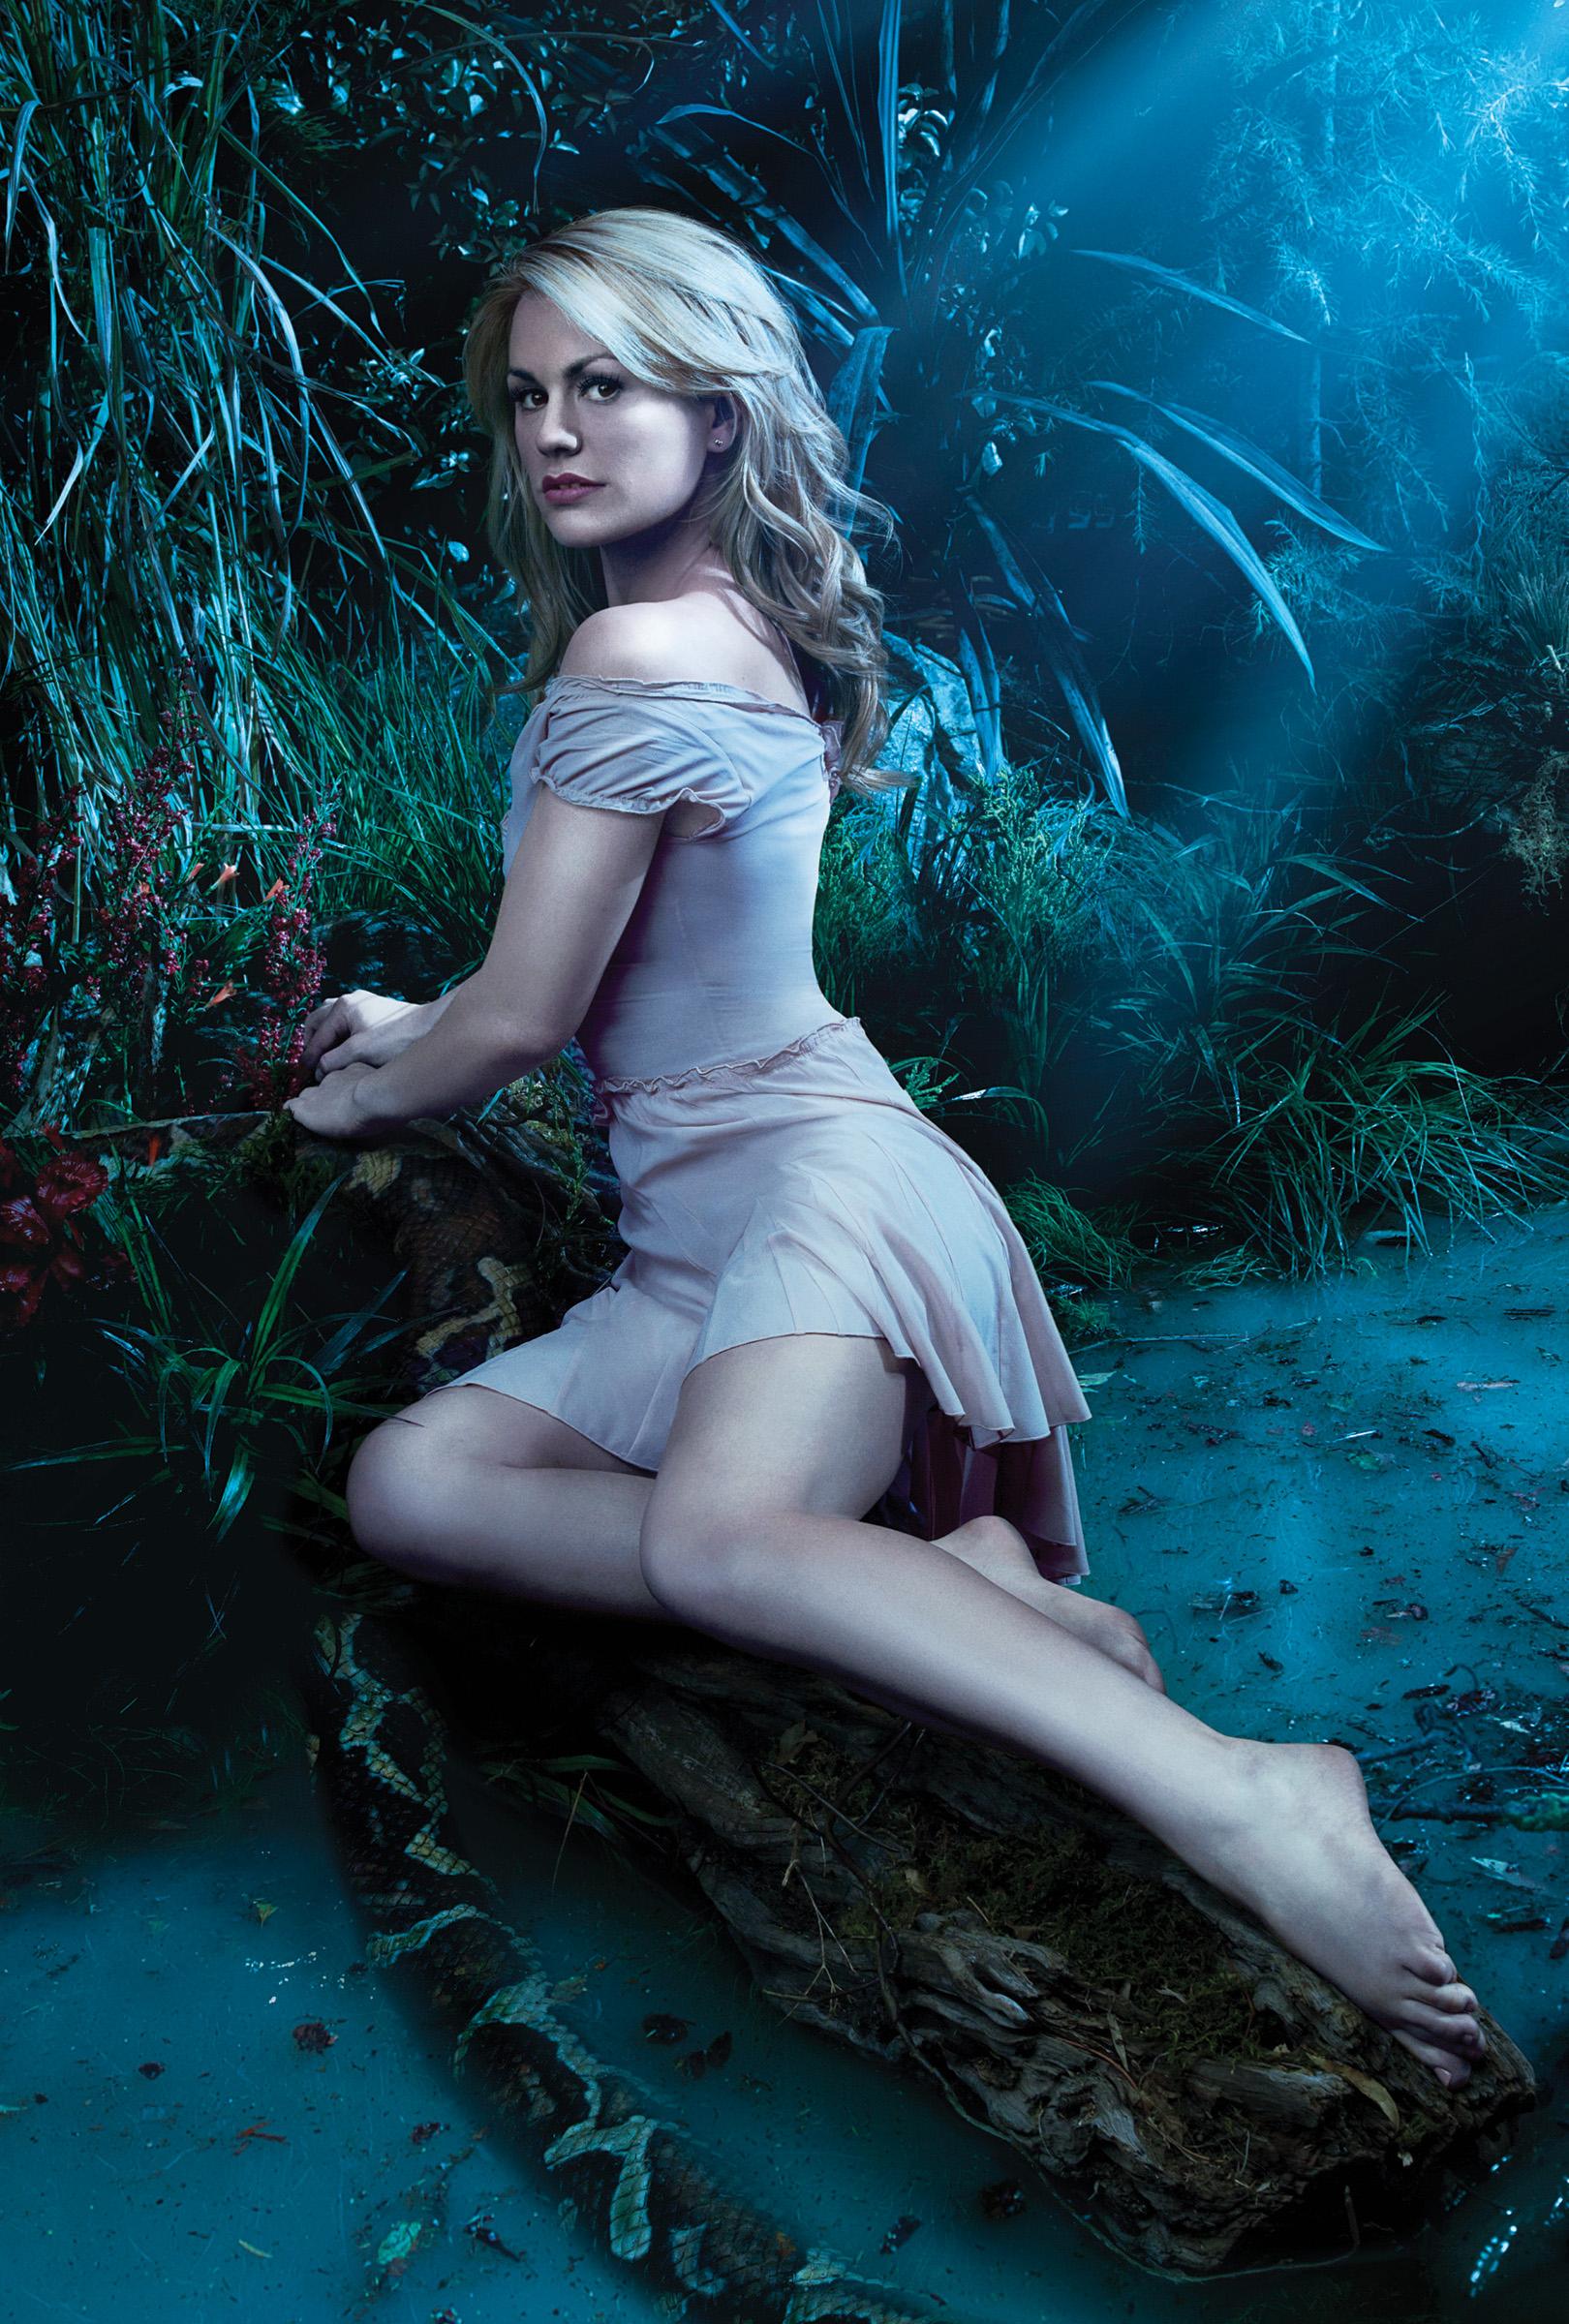 Anna paquin true blood nude